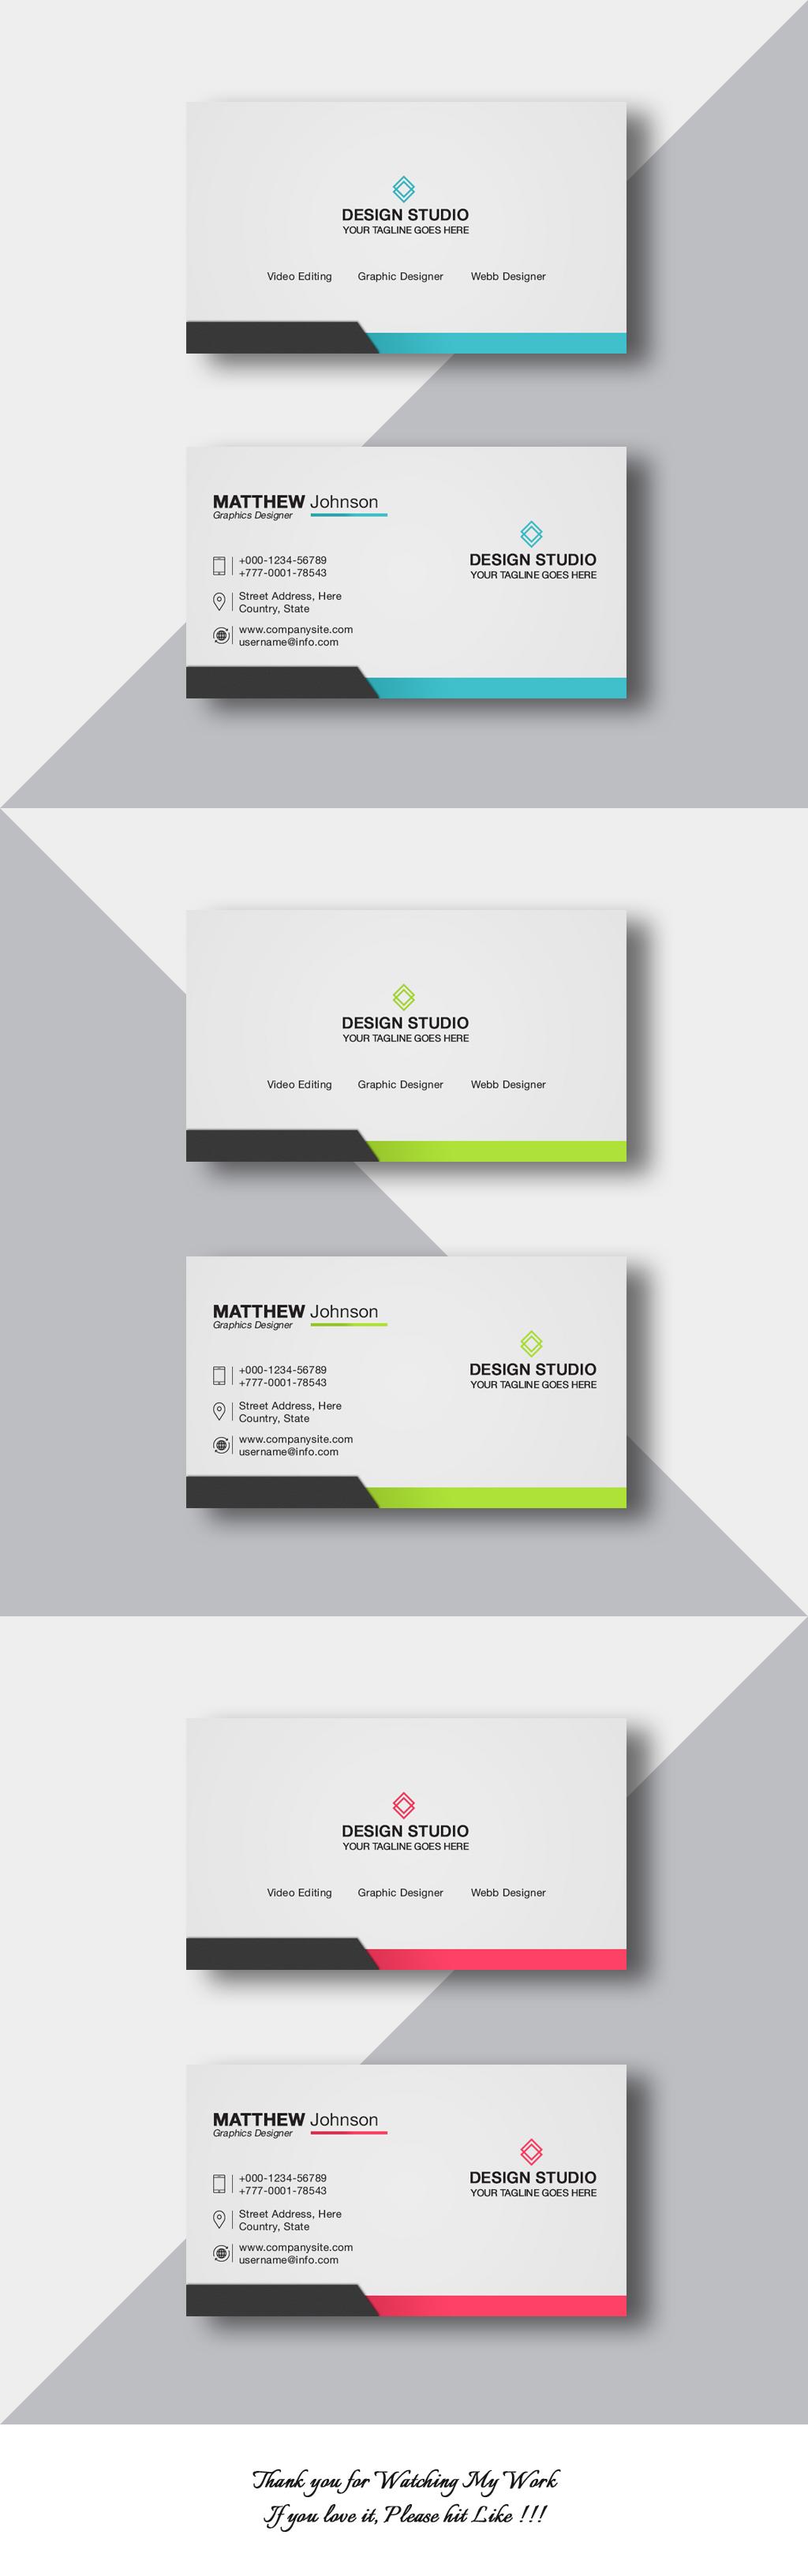 Free Business Card Design Templates Psd On Behance